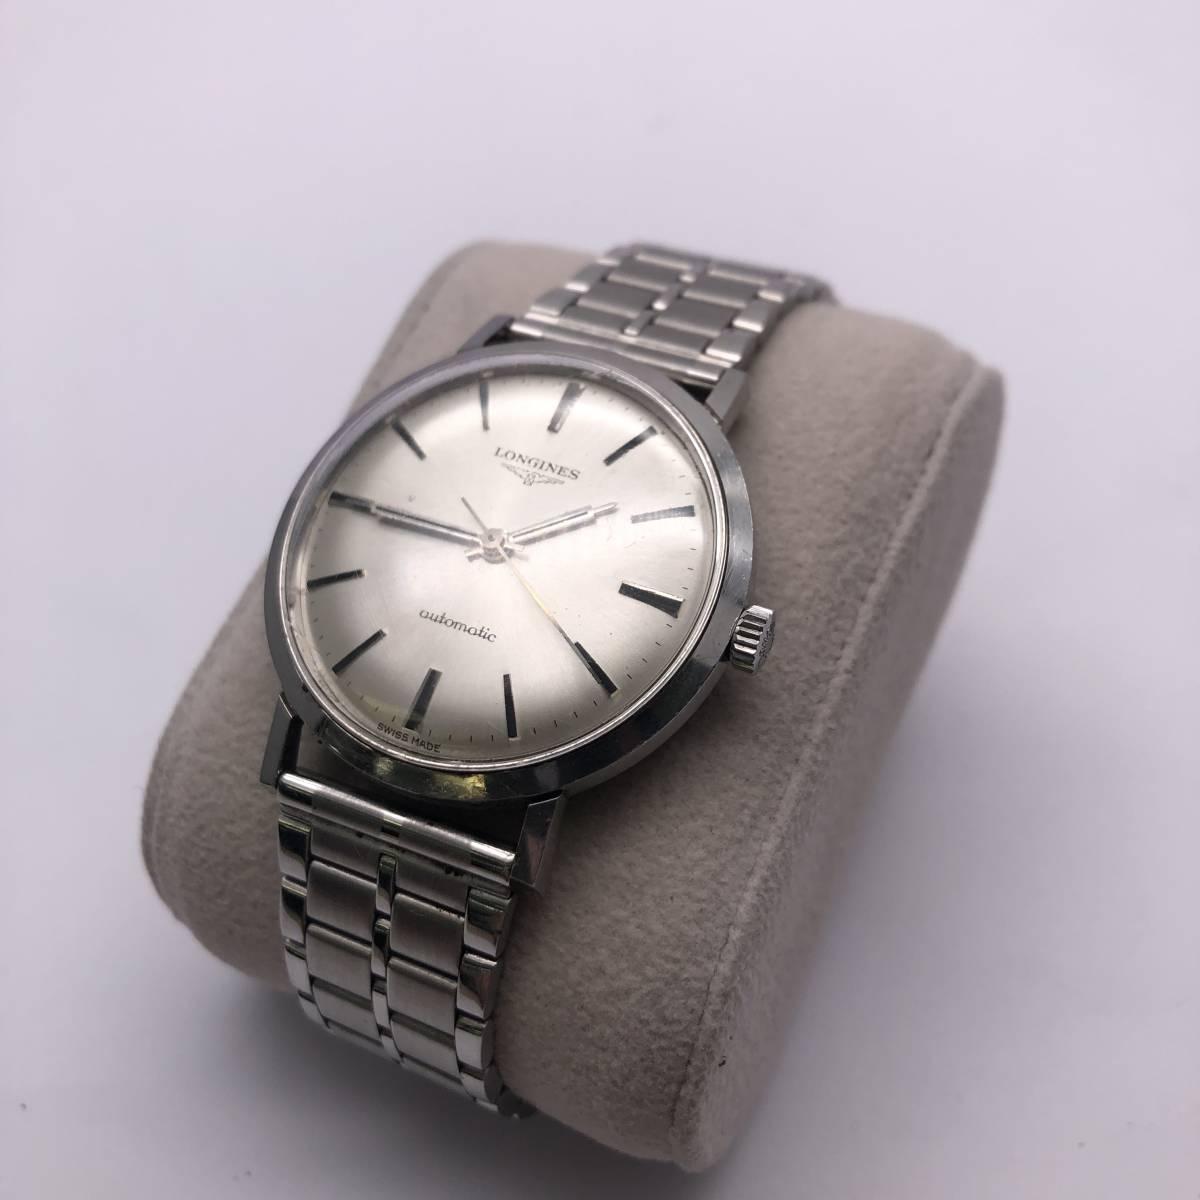 【975306】LONGINES 腕時計 自動巻き 稼働品 アンティーク ベルト社外